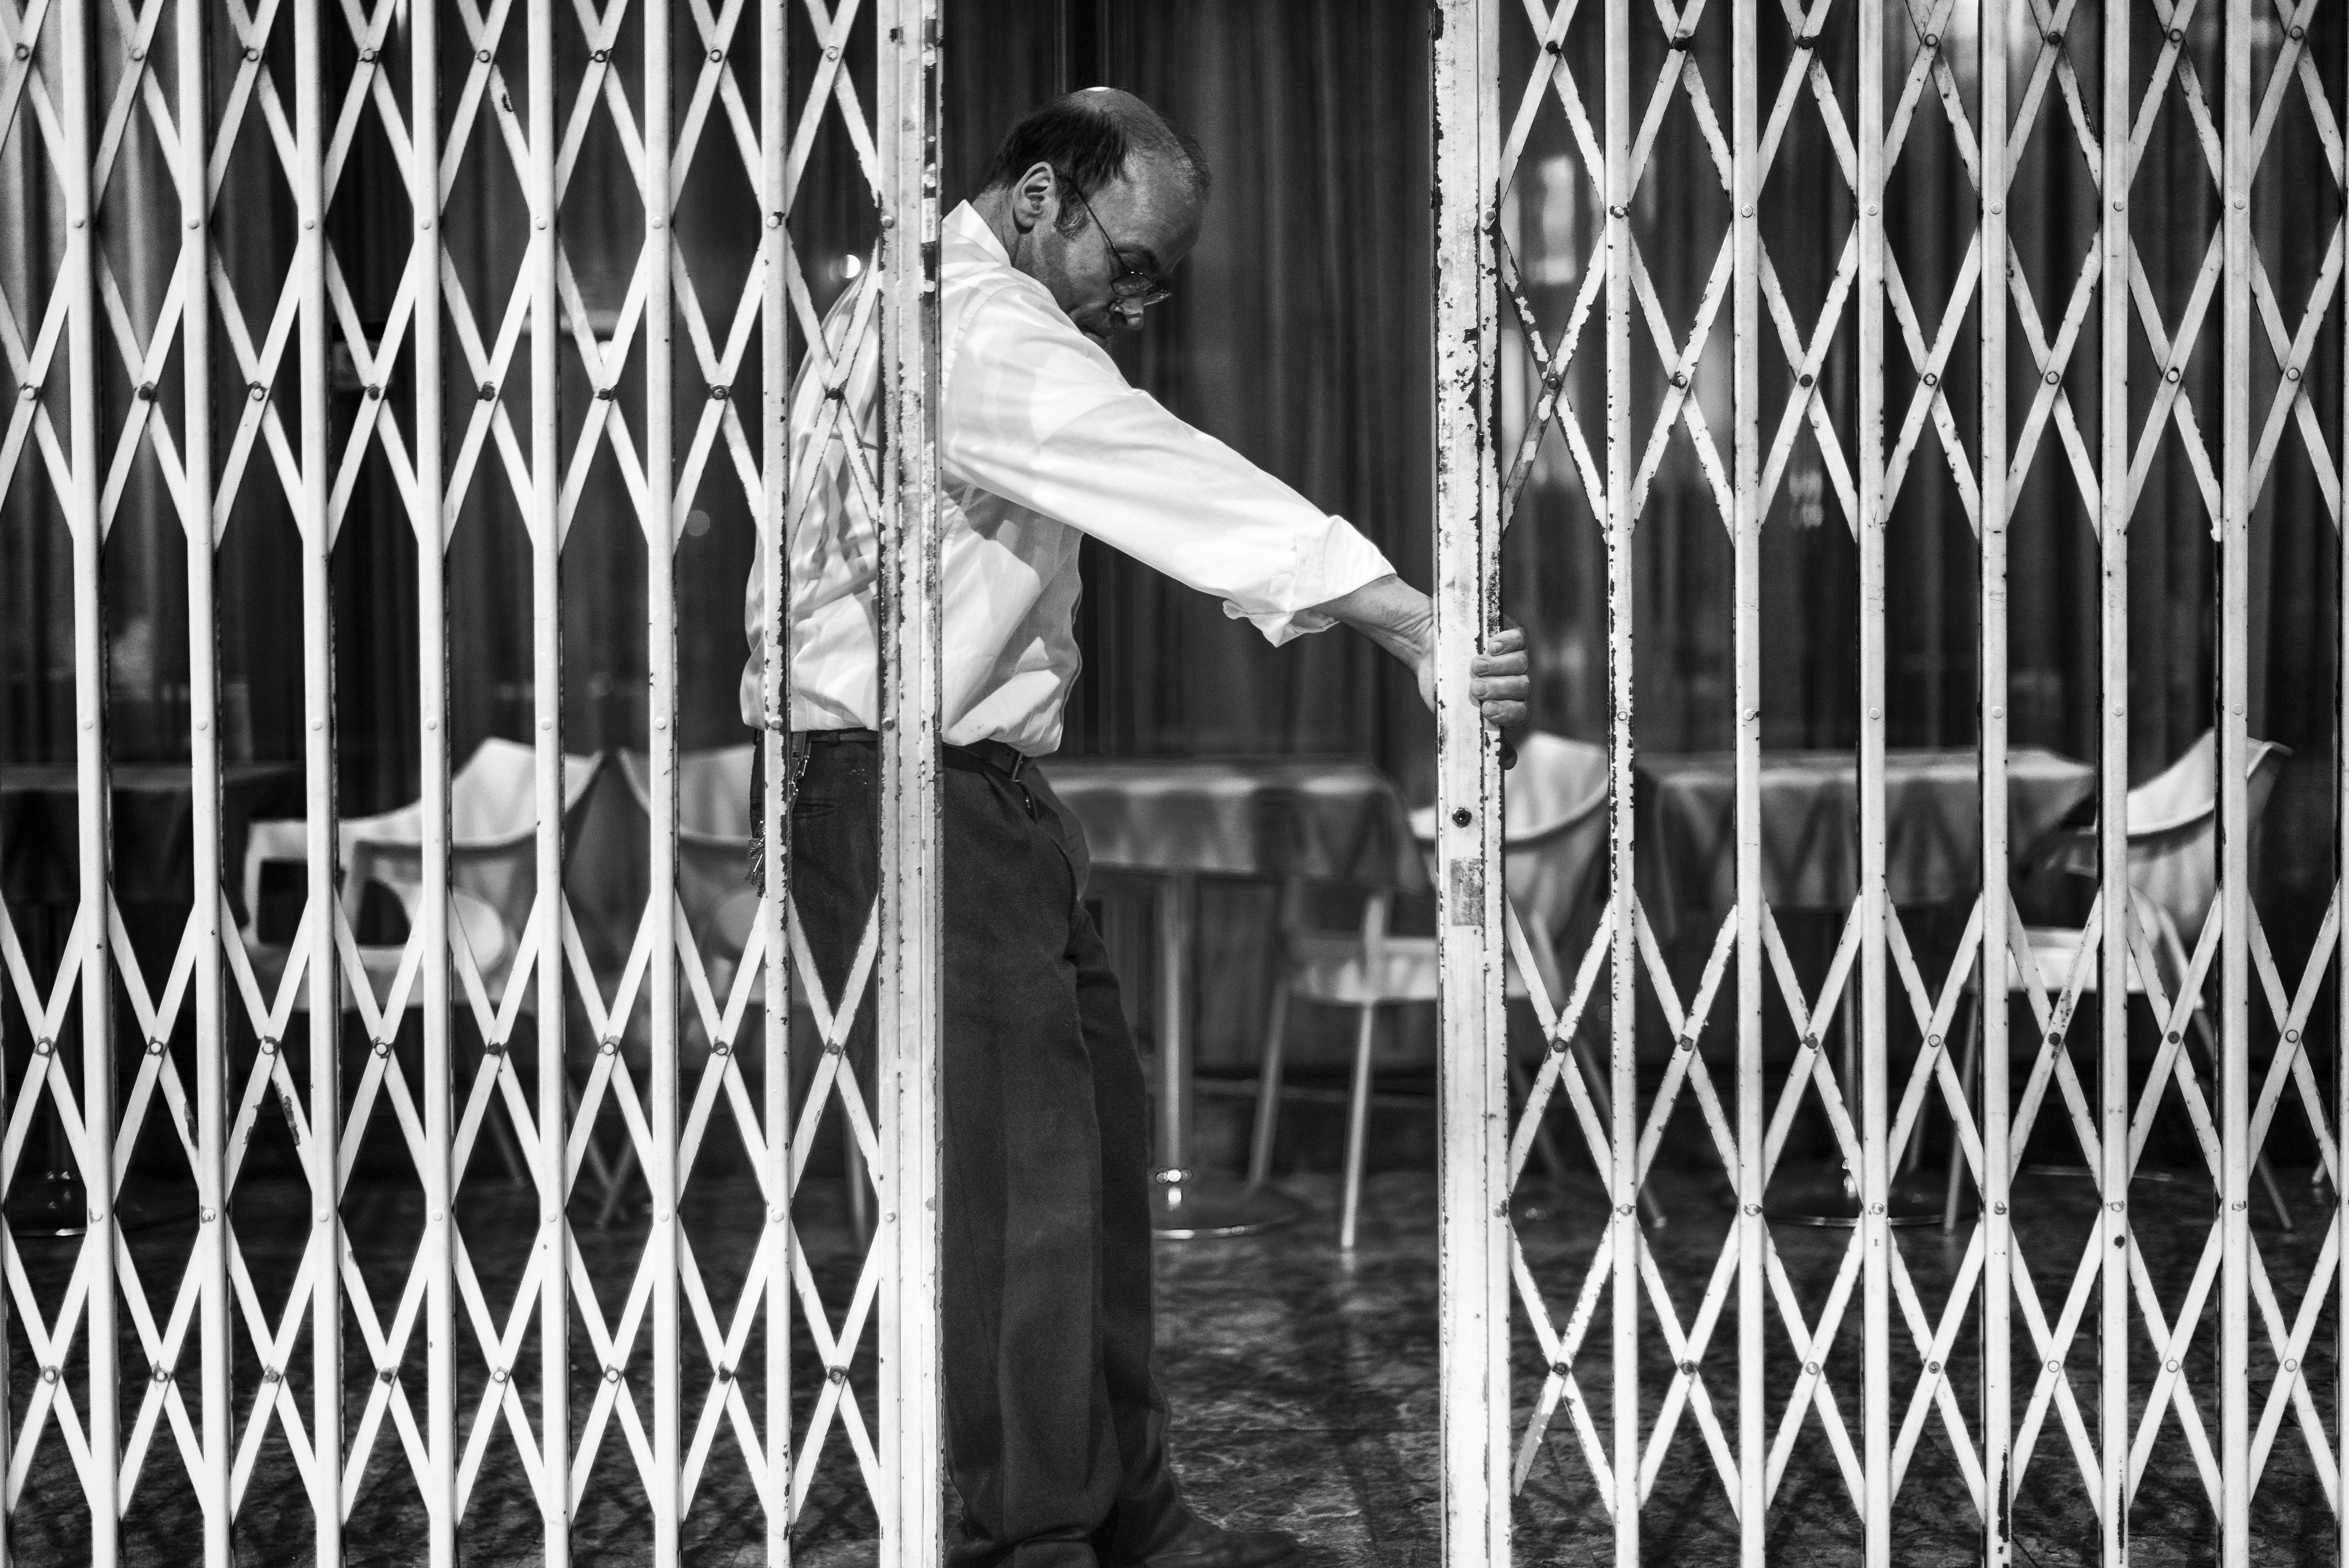 A gatekeeper closing the gate